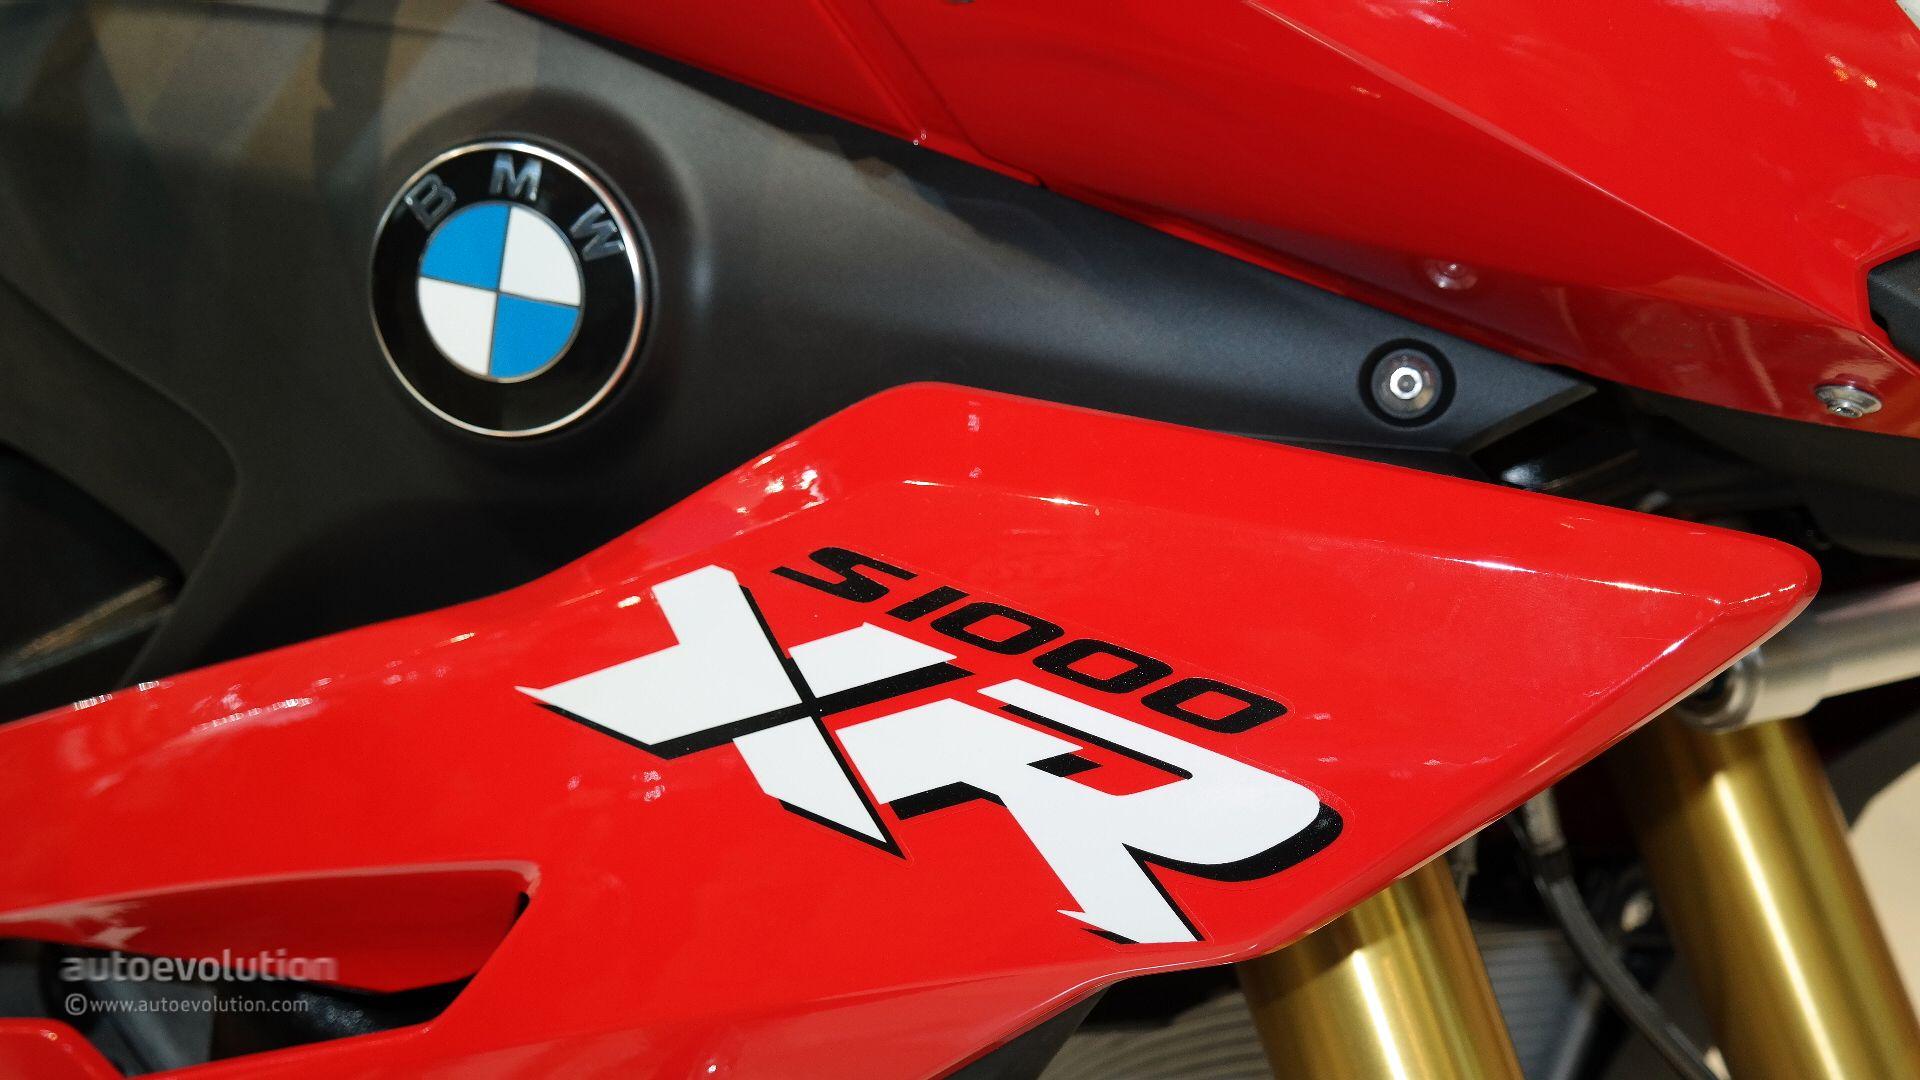 2015 Bmw S1000xr Shows Its Super Sport Fairings In Milan